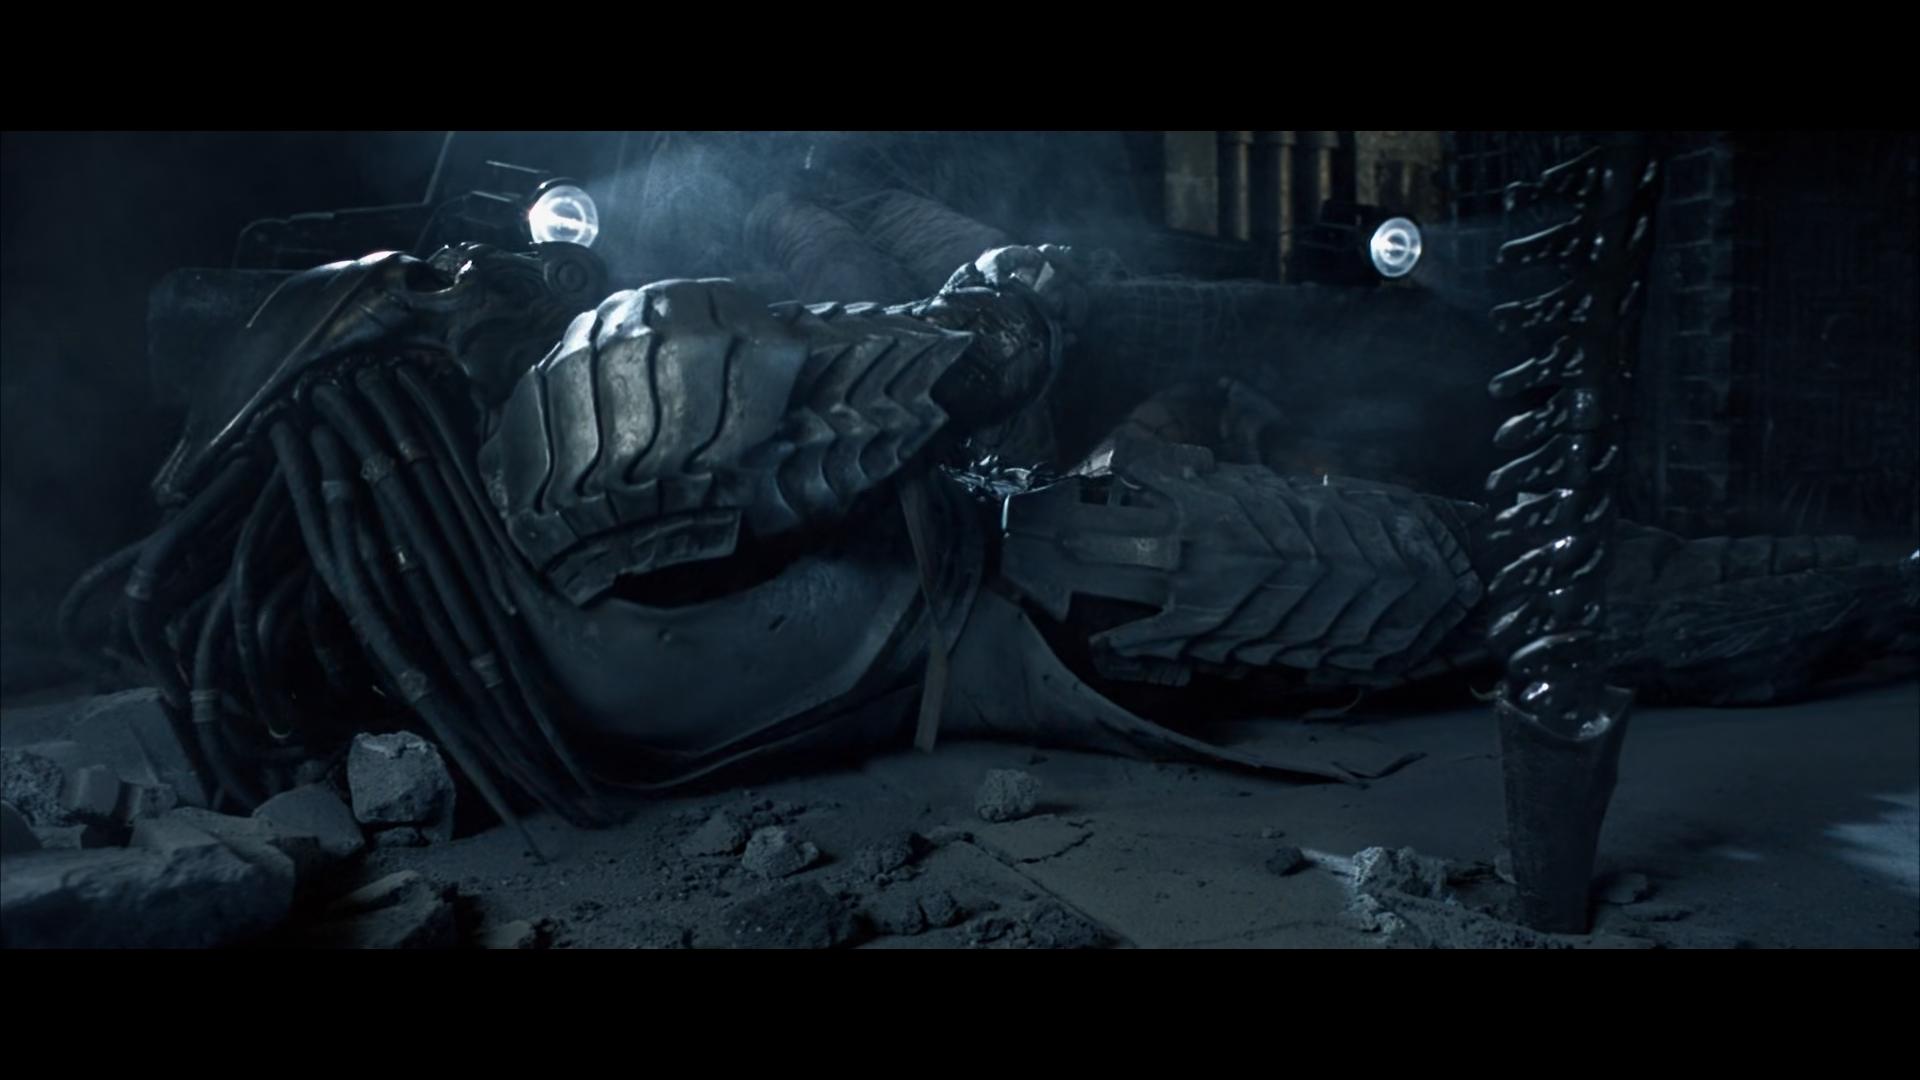 Avp Alien Vs Predator 2004 Unrated 1080p Blu Ray 10bit X265 Dts Dr3ad Lo X Mkv Snapshot 01 01 19 201 Imgbb